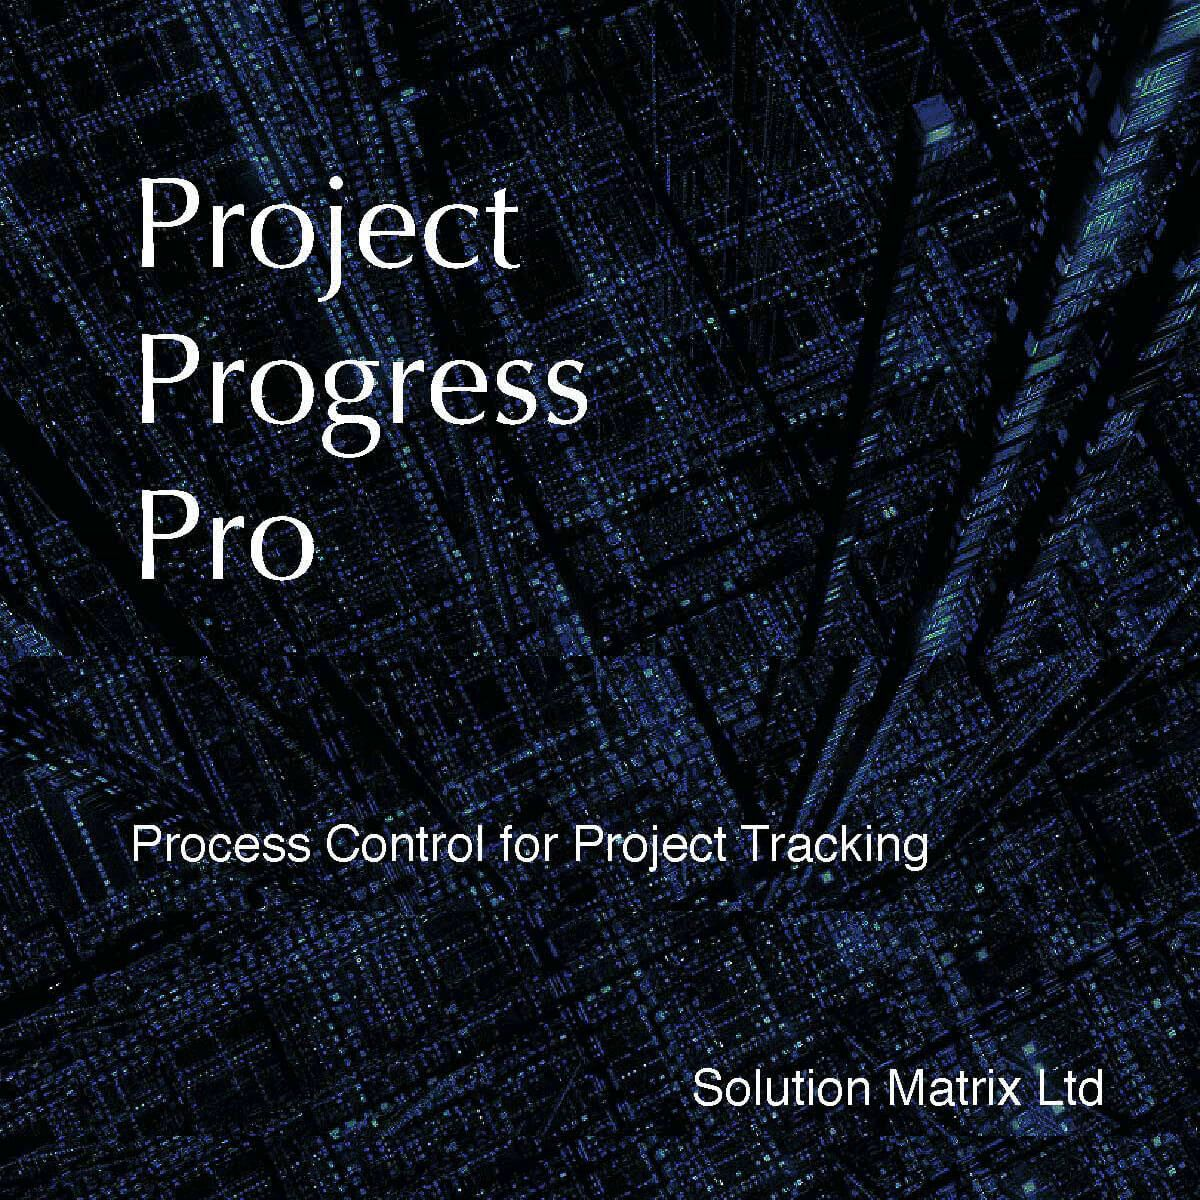 Buy the ebook Project Progress Pro